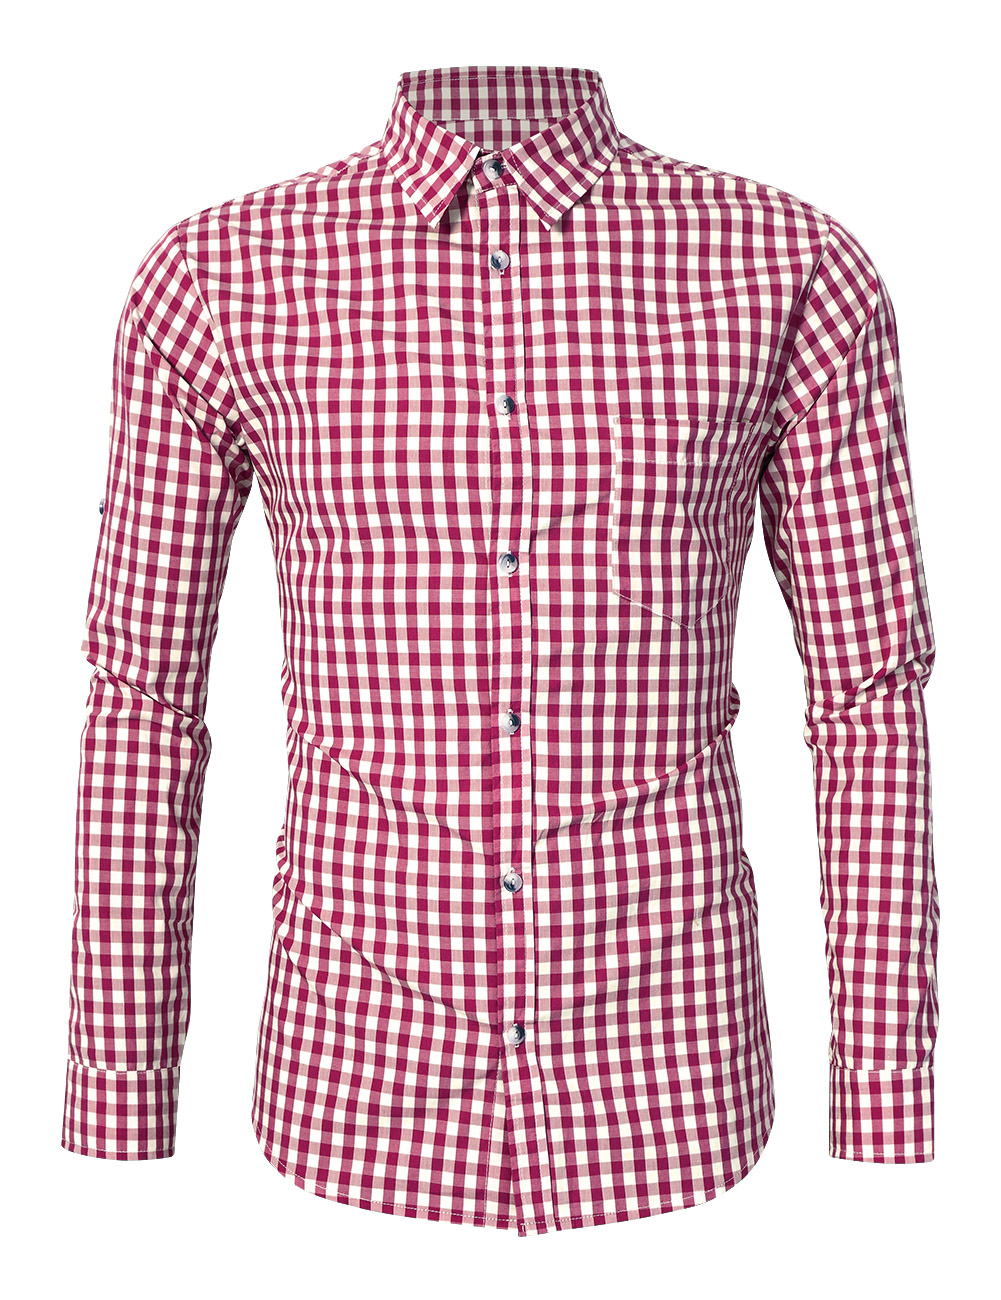 [EU Direct] Glorystar Men's Long Sleeve Checkered Bavarian Oktoberfest Shirt for Lederhosen Red_S